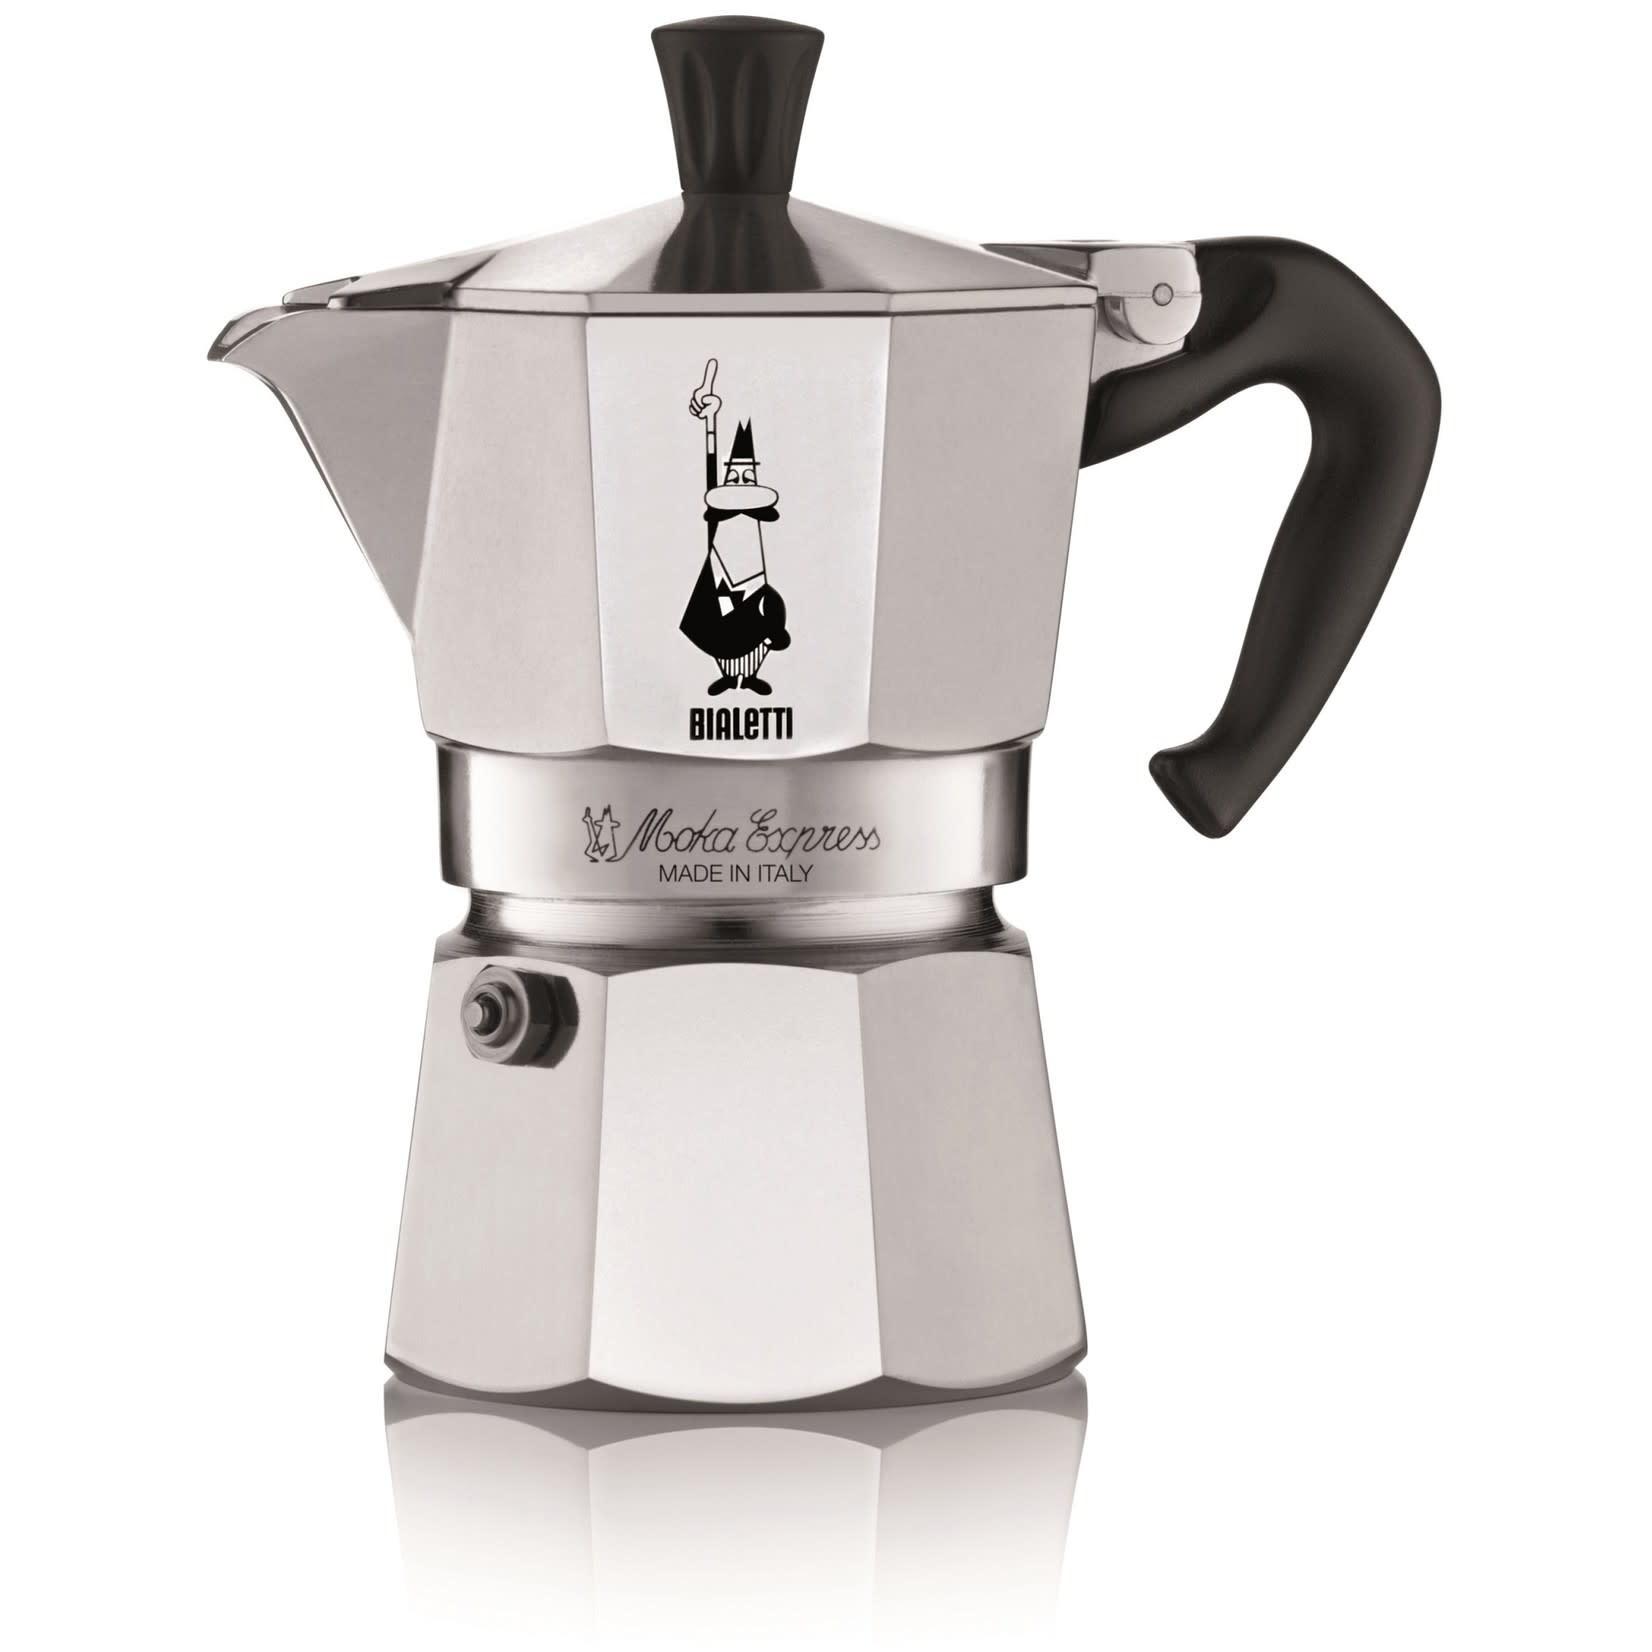 Bialetti Moka Express 2-kops Espressopot